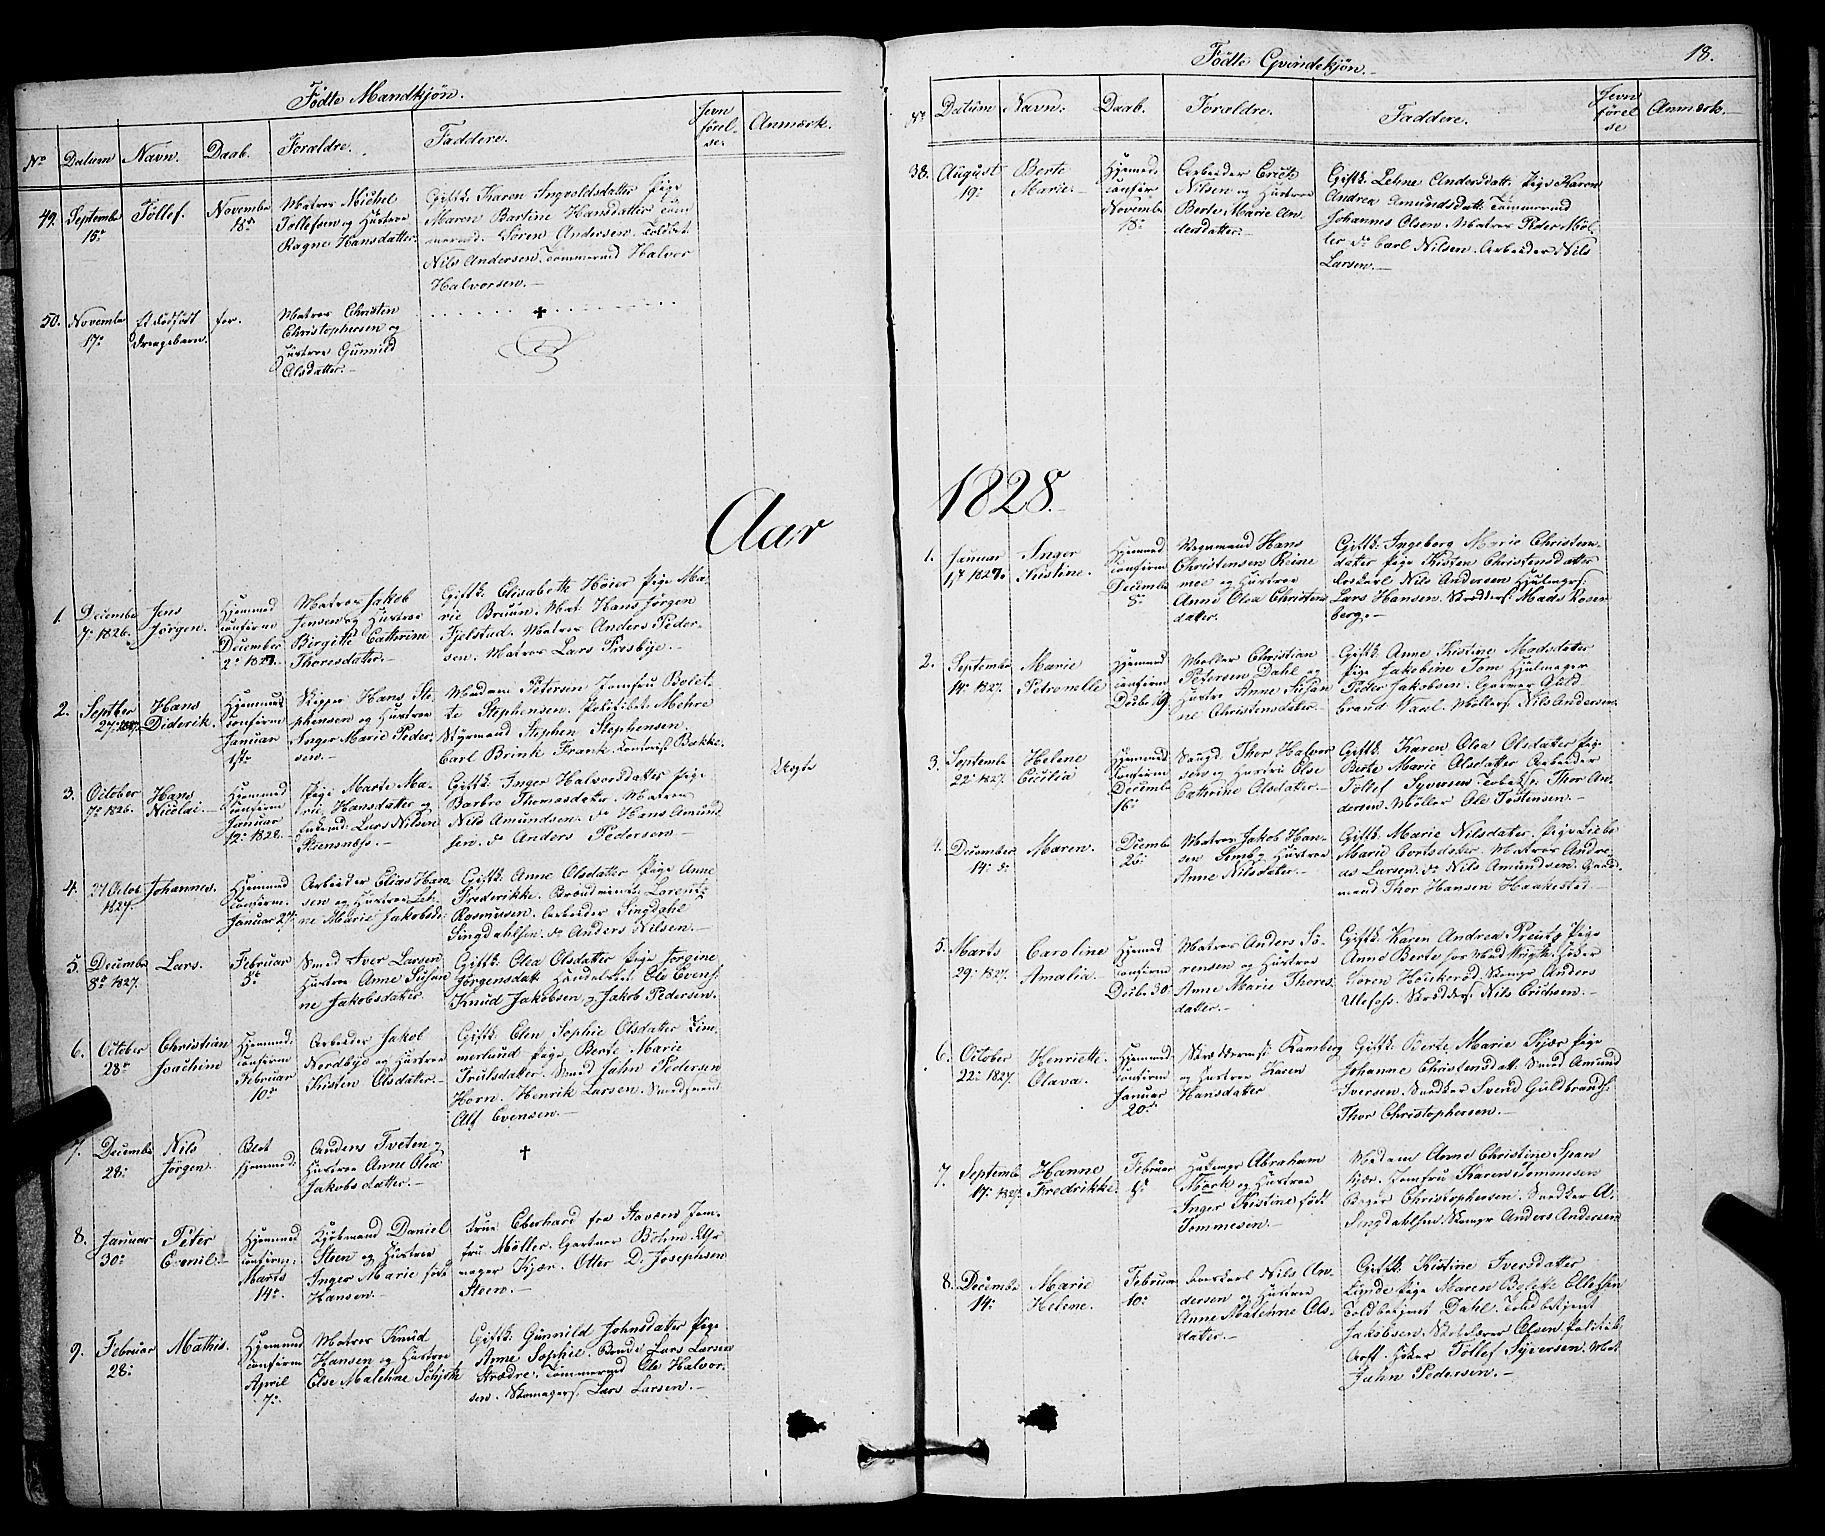 SAKO, Larvik kirkebøker, F/Fa/L0002: Ministerialbok nr. I 2, 1825-1847, s. 18